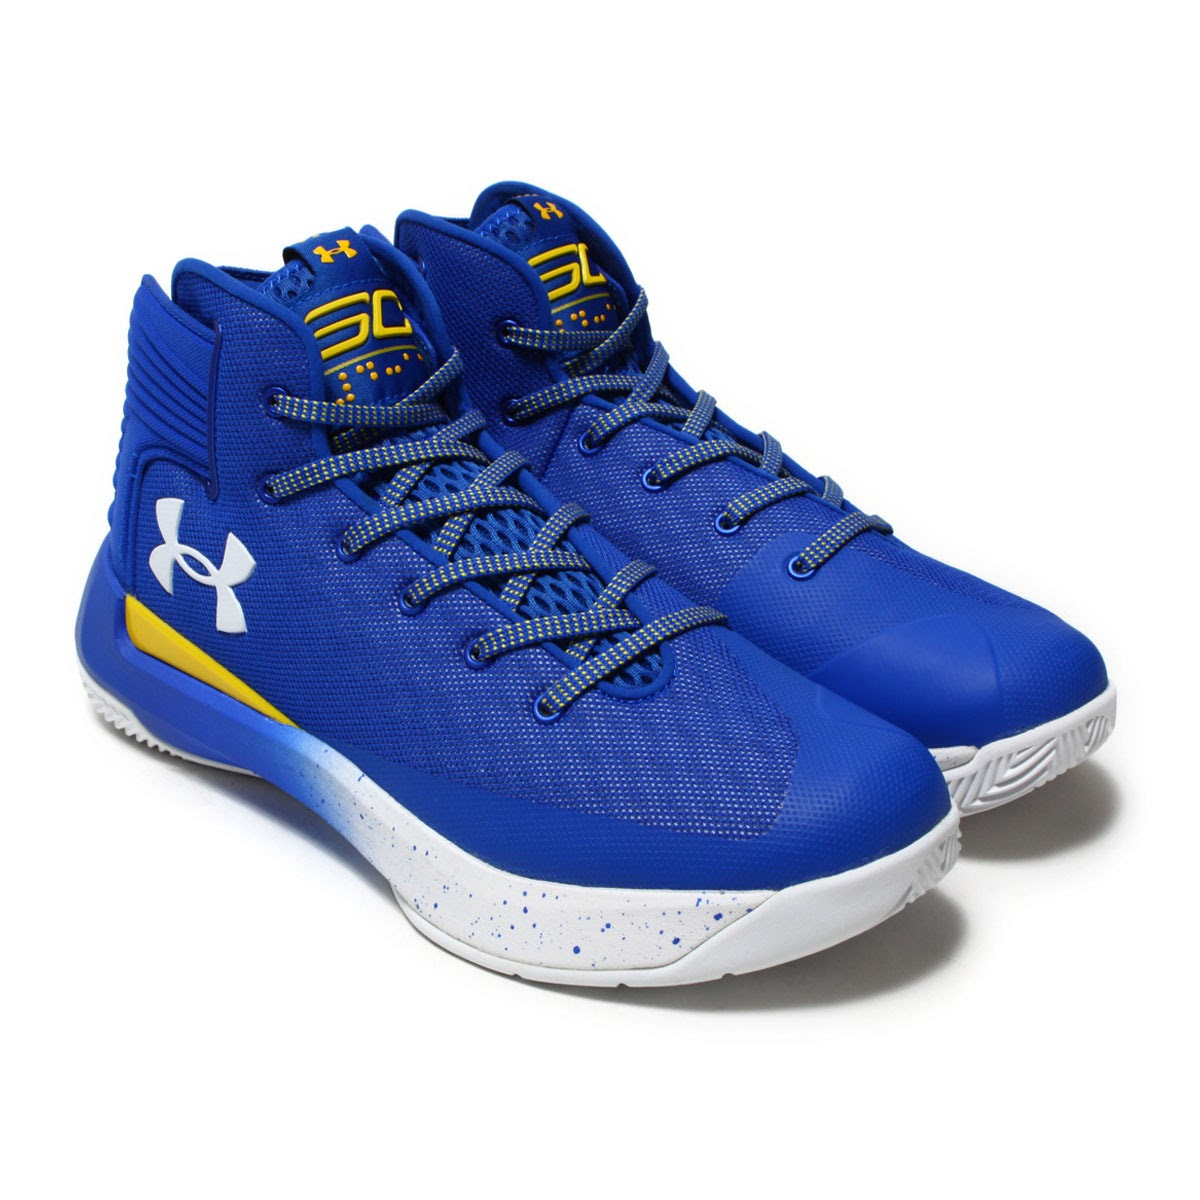 official photos cc178 b530f Details about Under Armour Men's Curry 3 Zero Athletic Basketball Shoes  Blue Size 13.0M